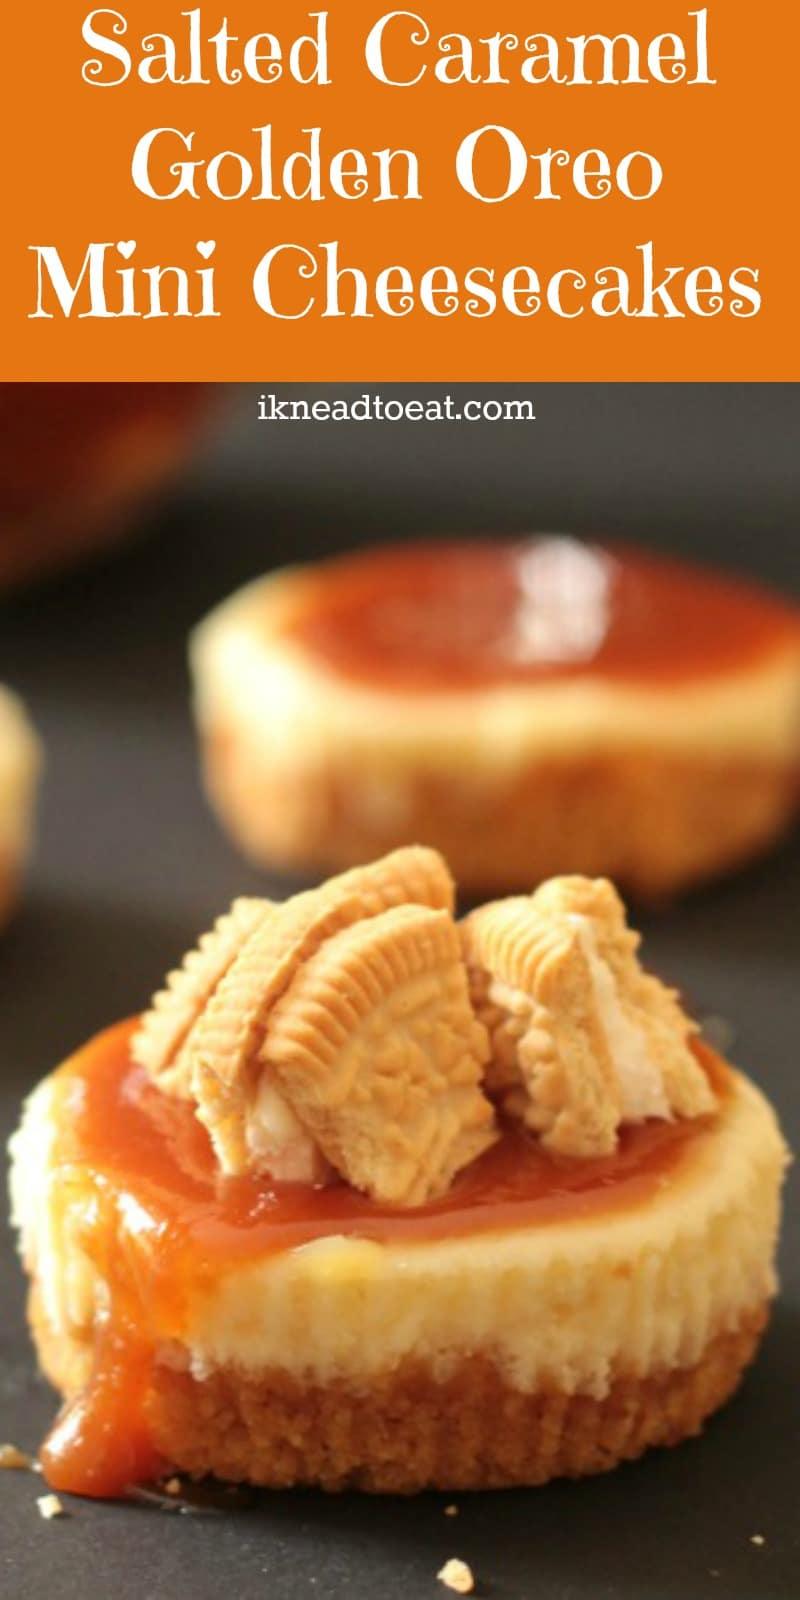 Salted Caramel Golden Oreo Mini Cheesecakes